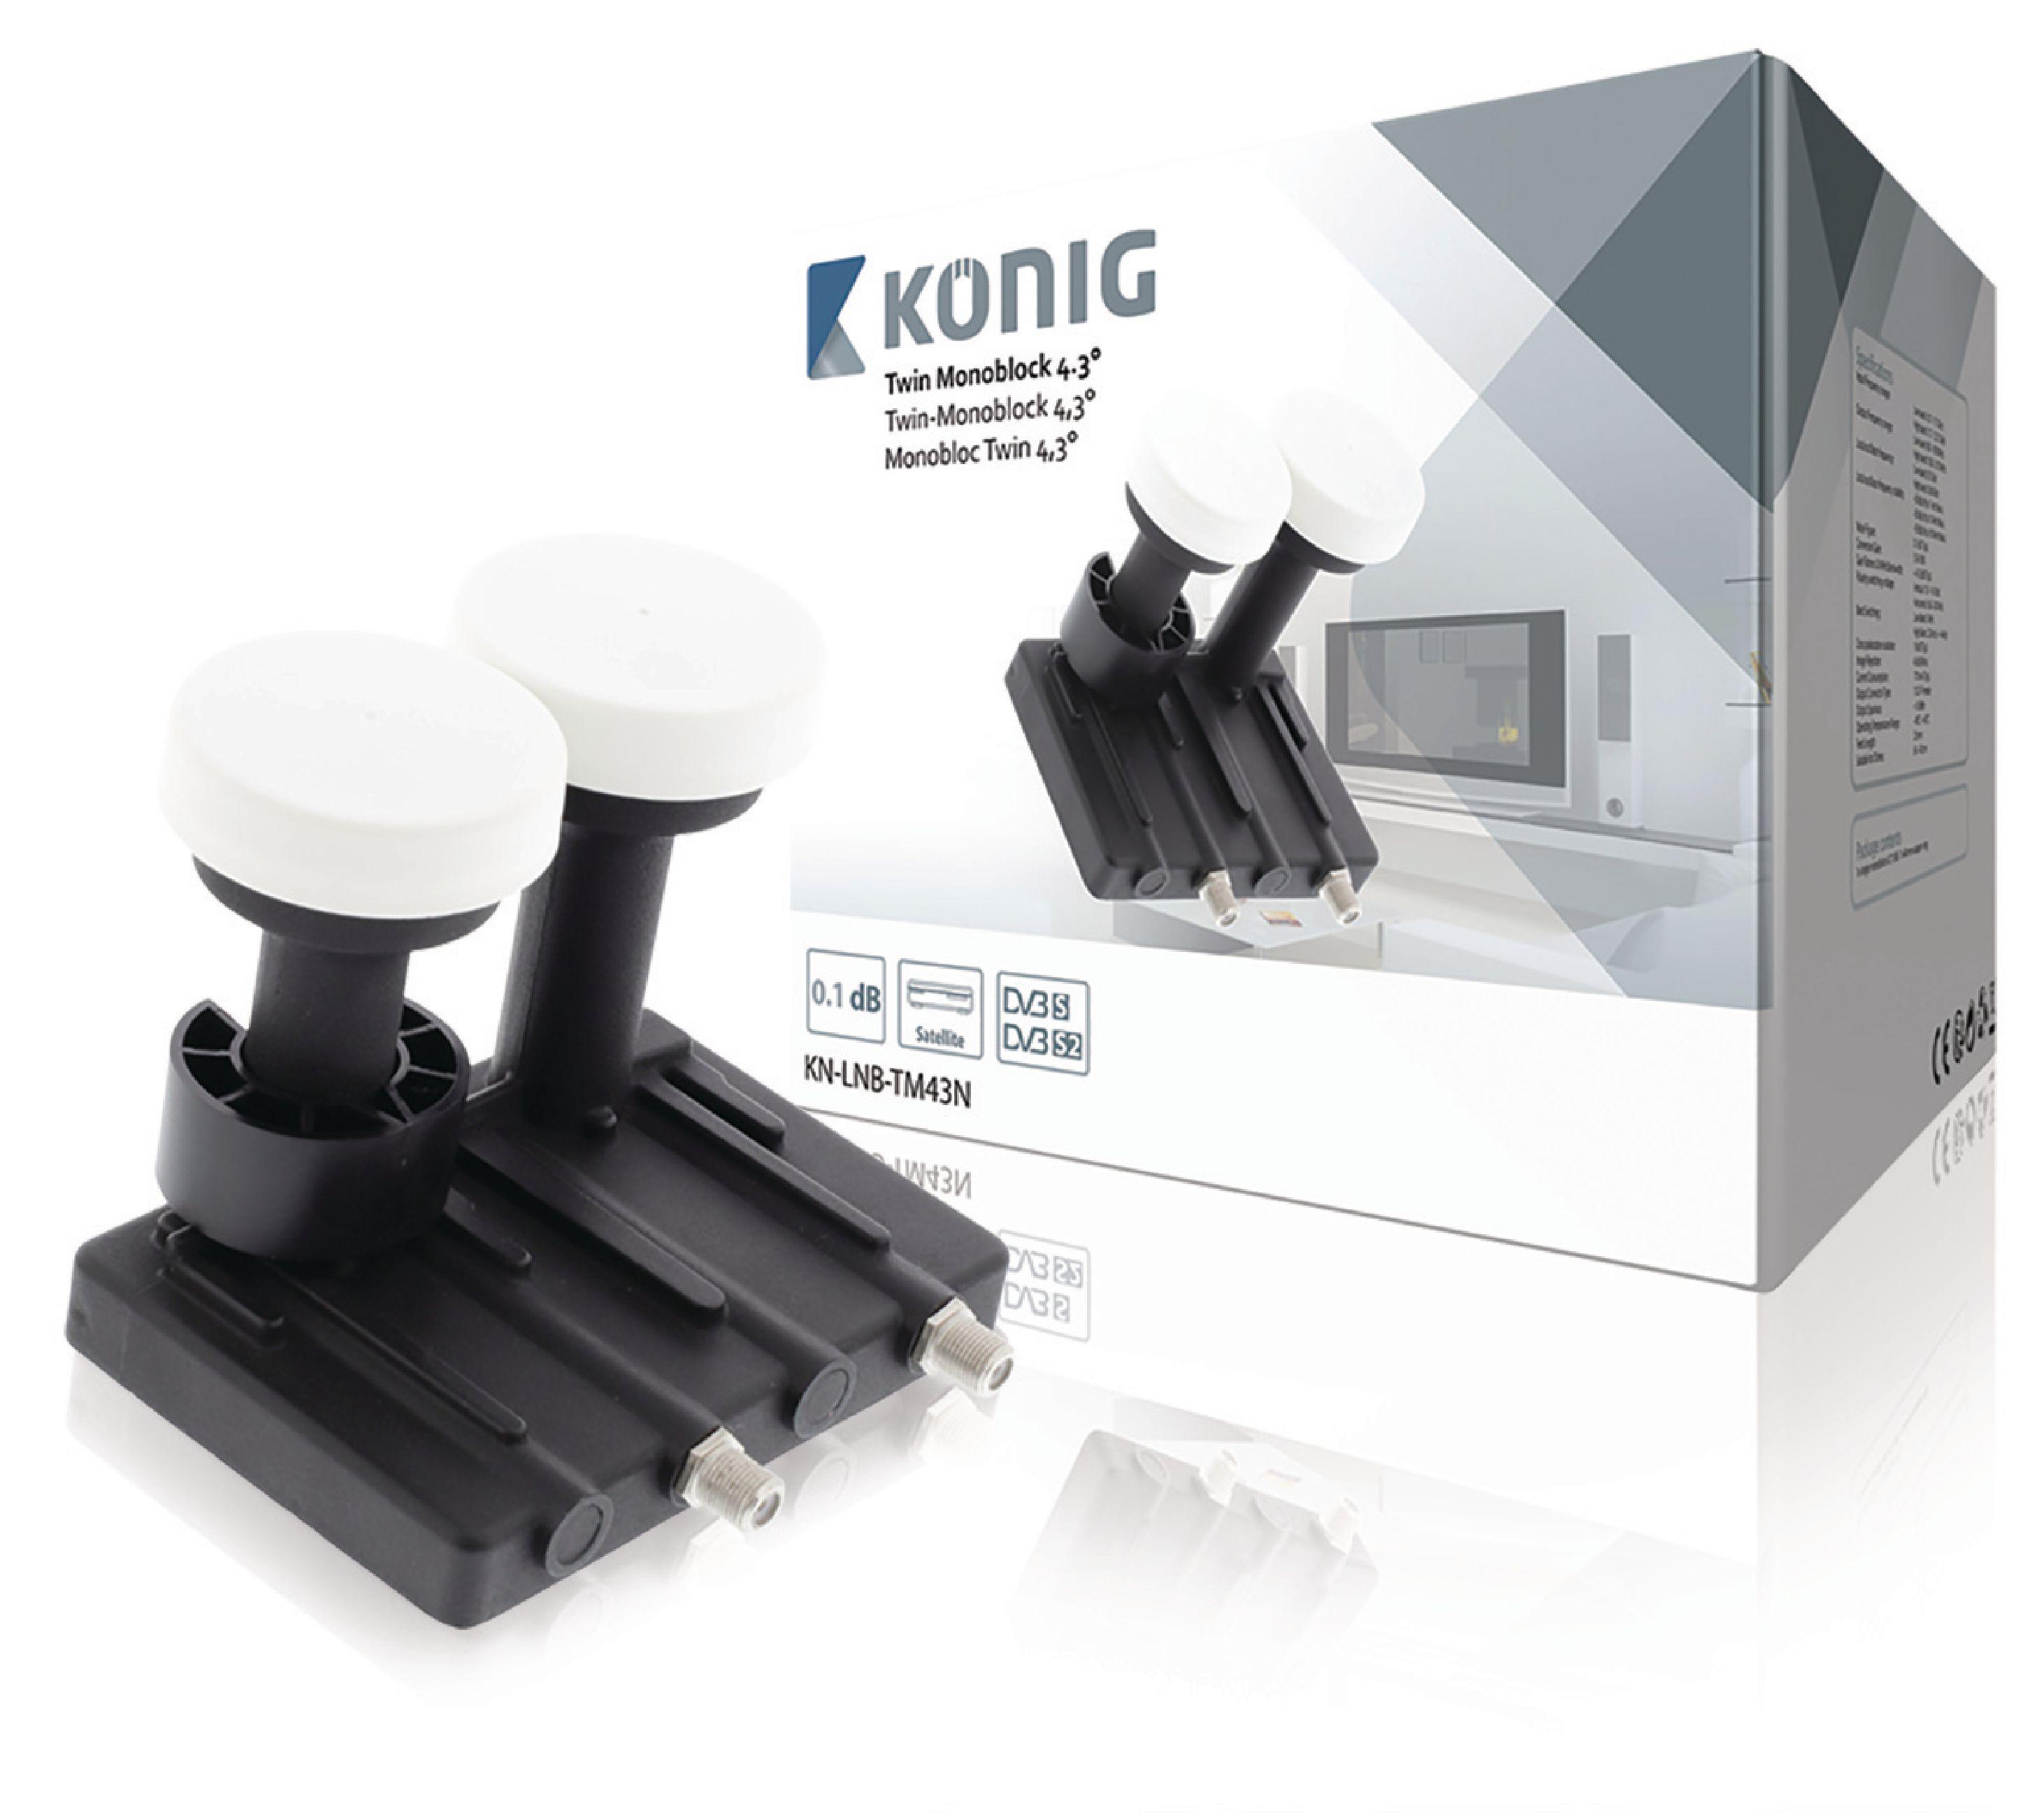 LNB Twin monoblok 4.3° 0.1 dB, König KN-LNB-TM43N